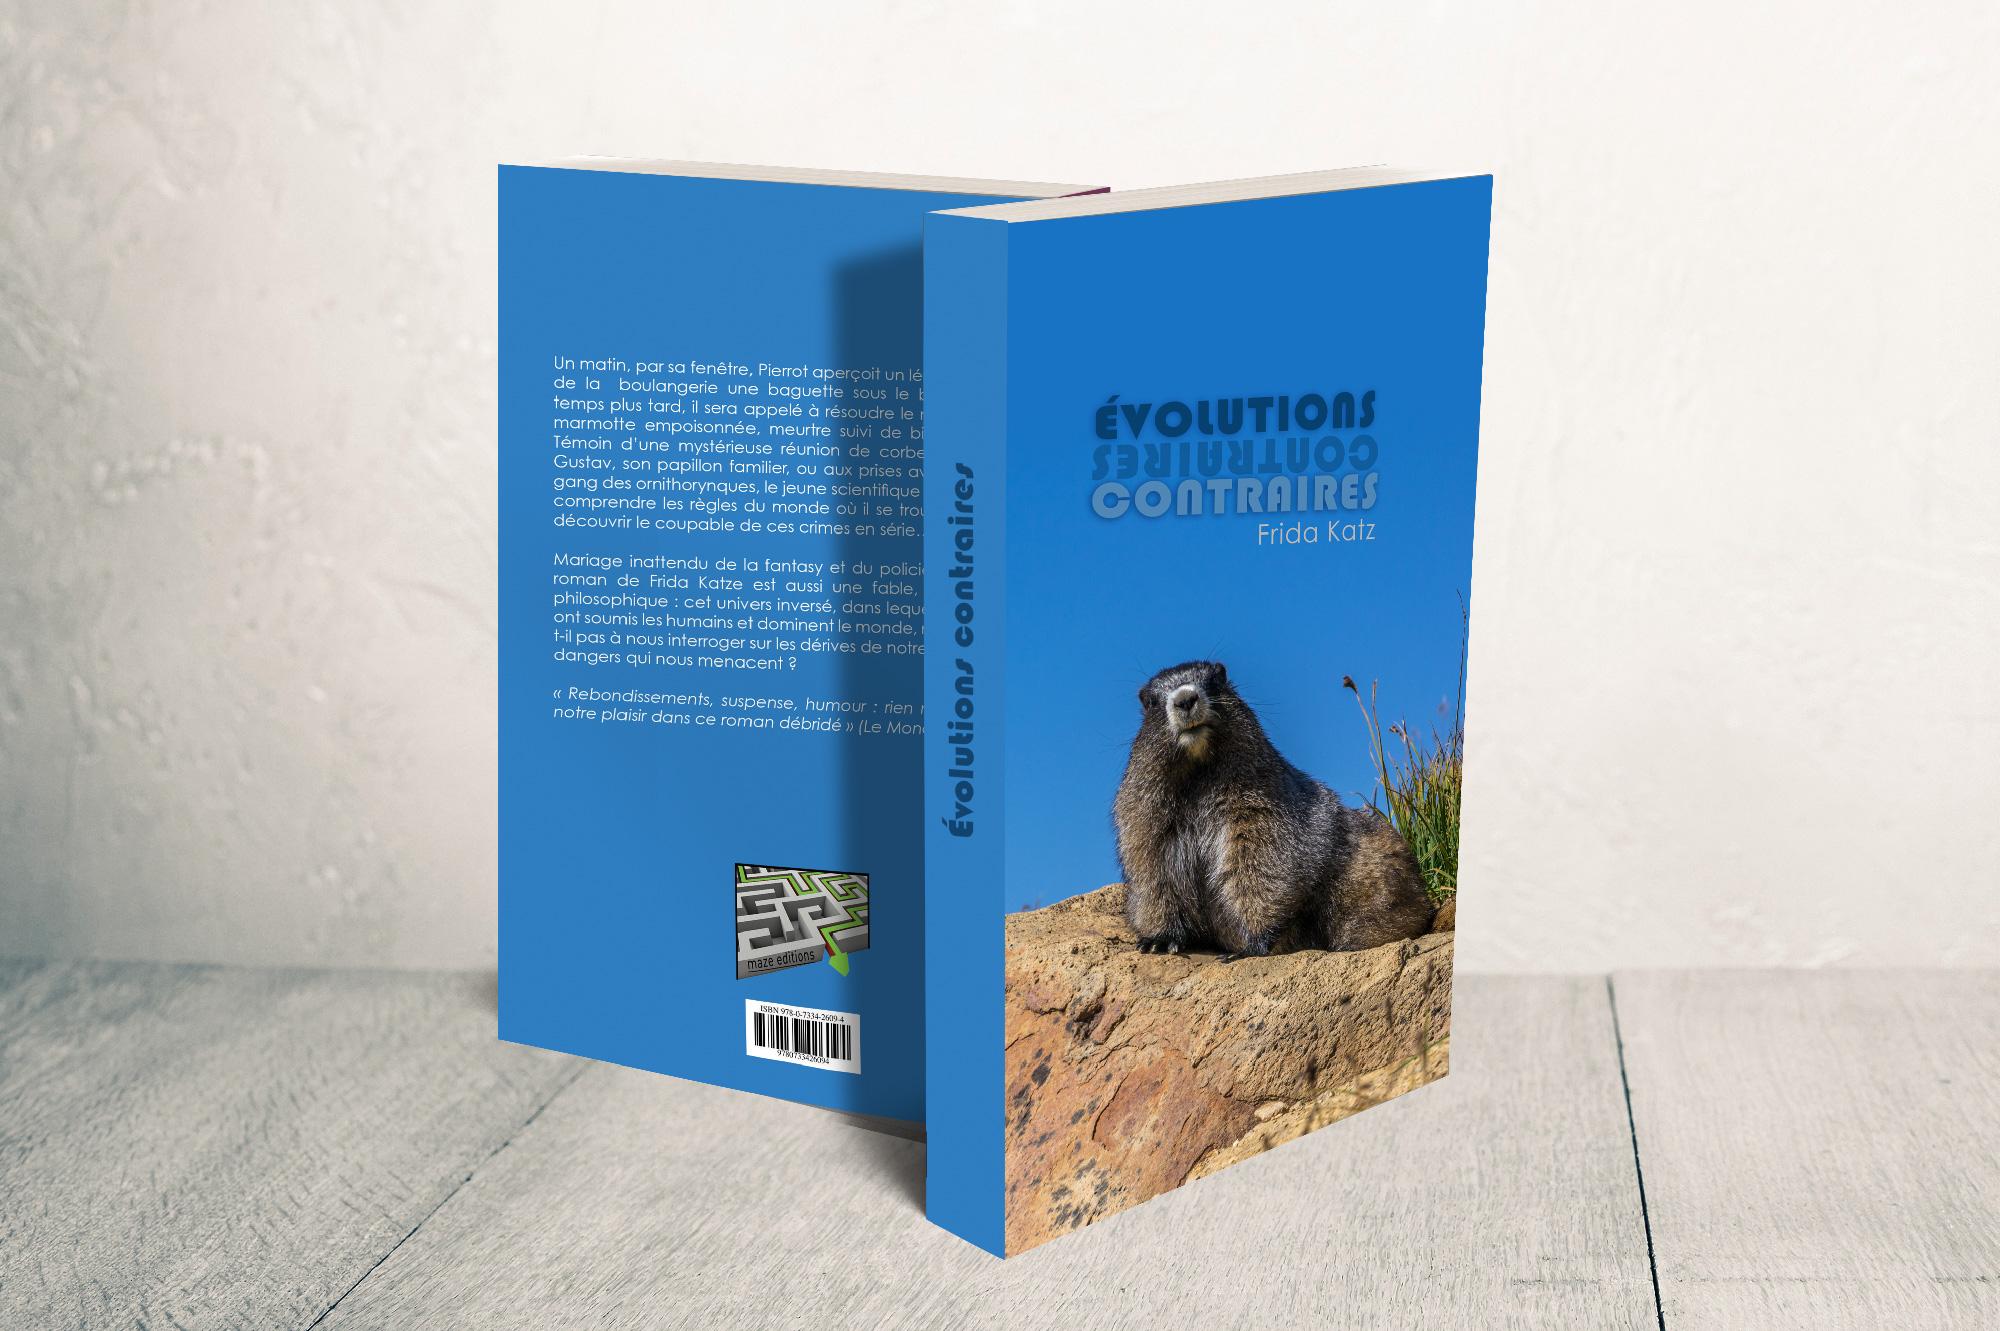 Evolutions contraires